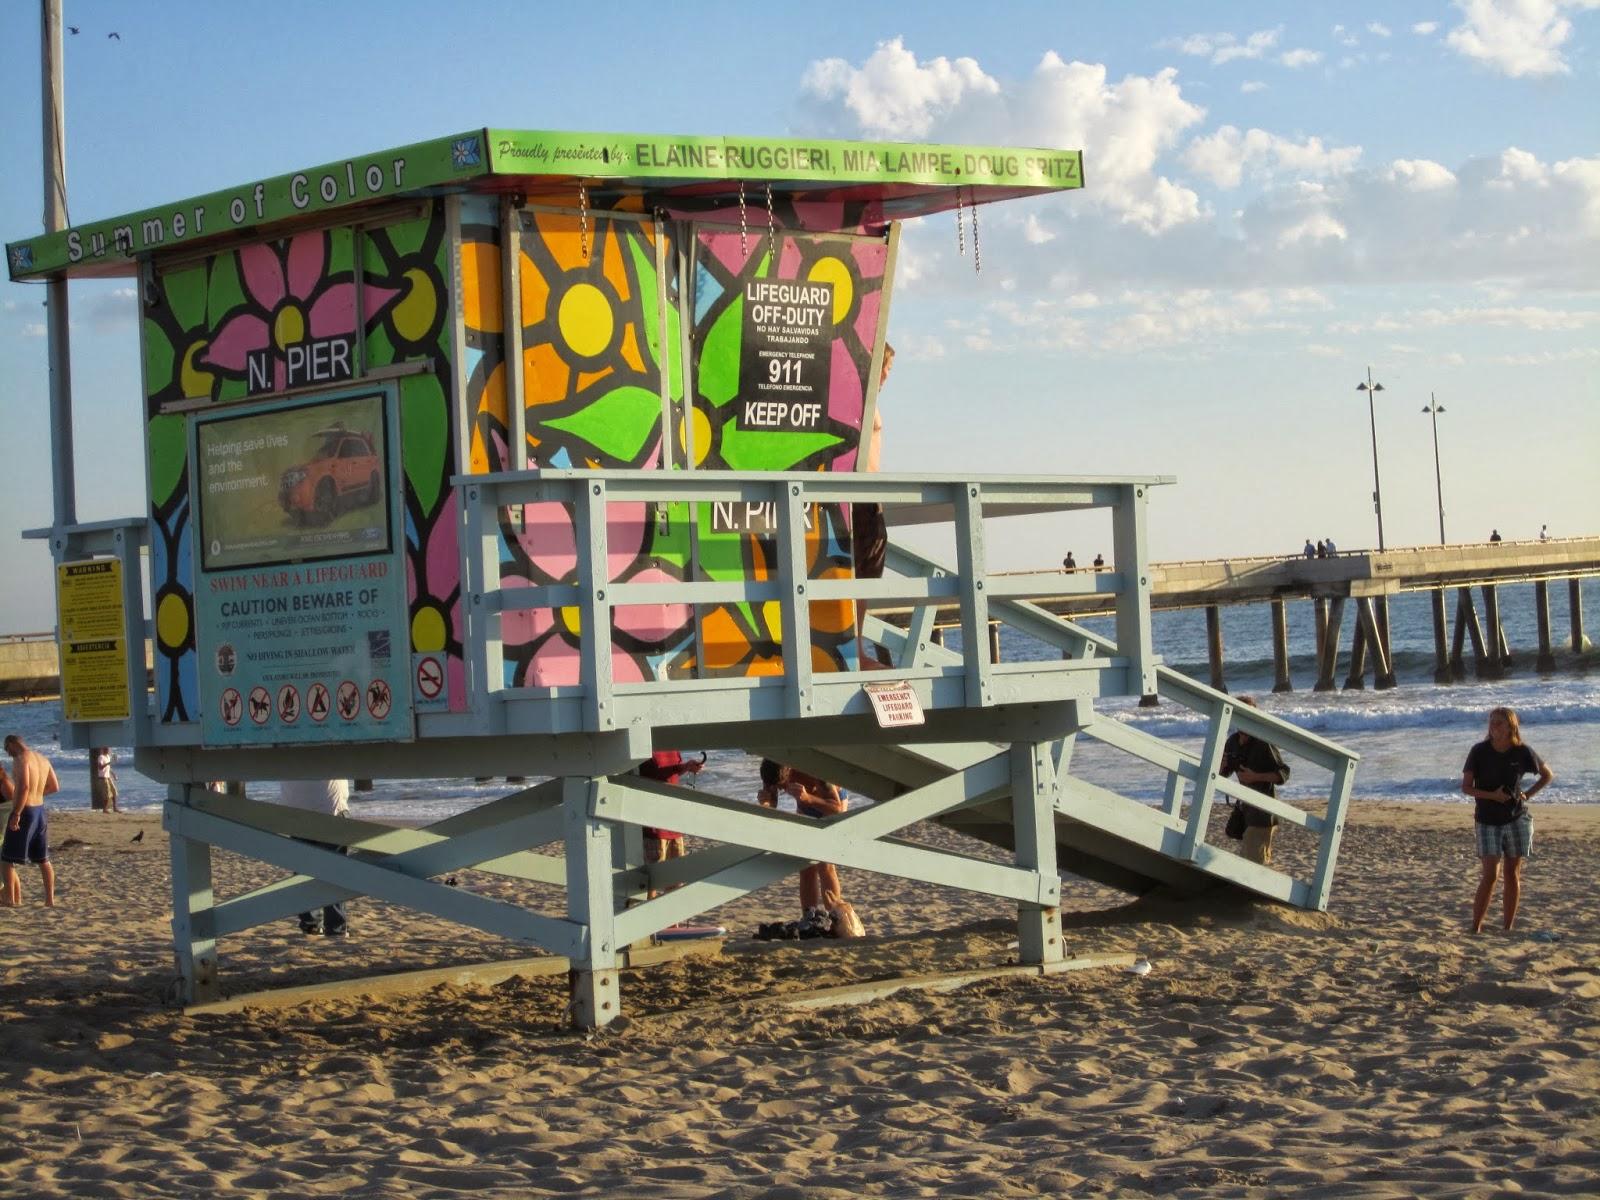 LIfe guard stand california beach, colorful